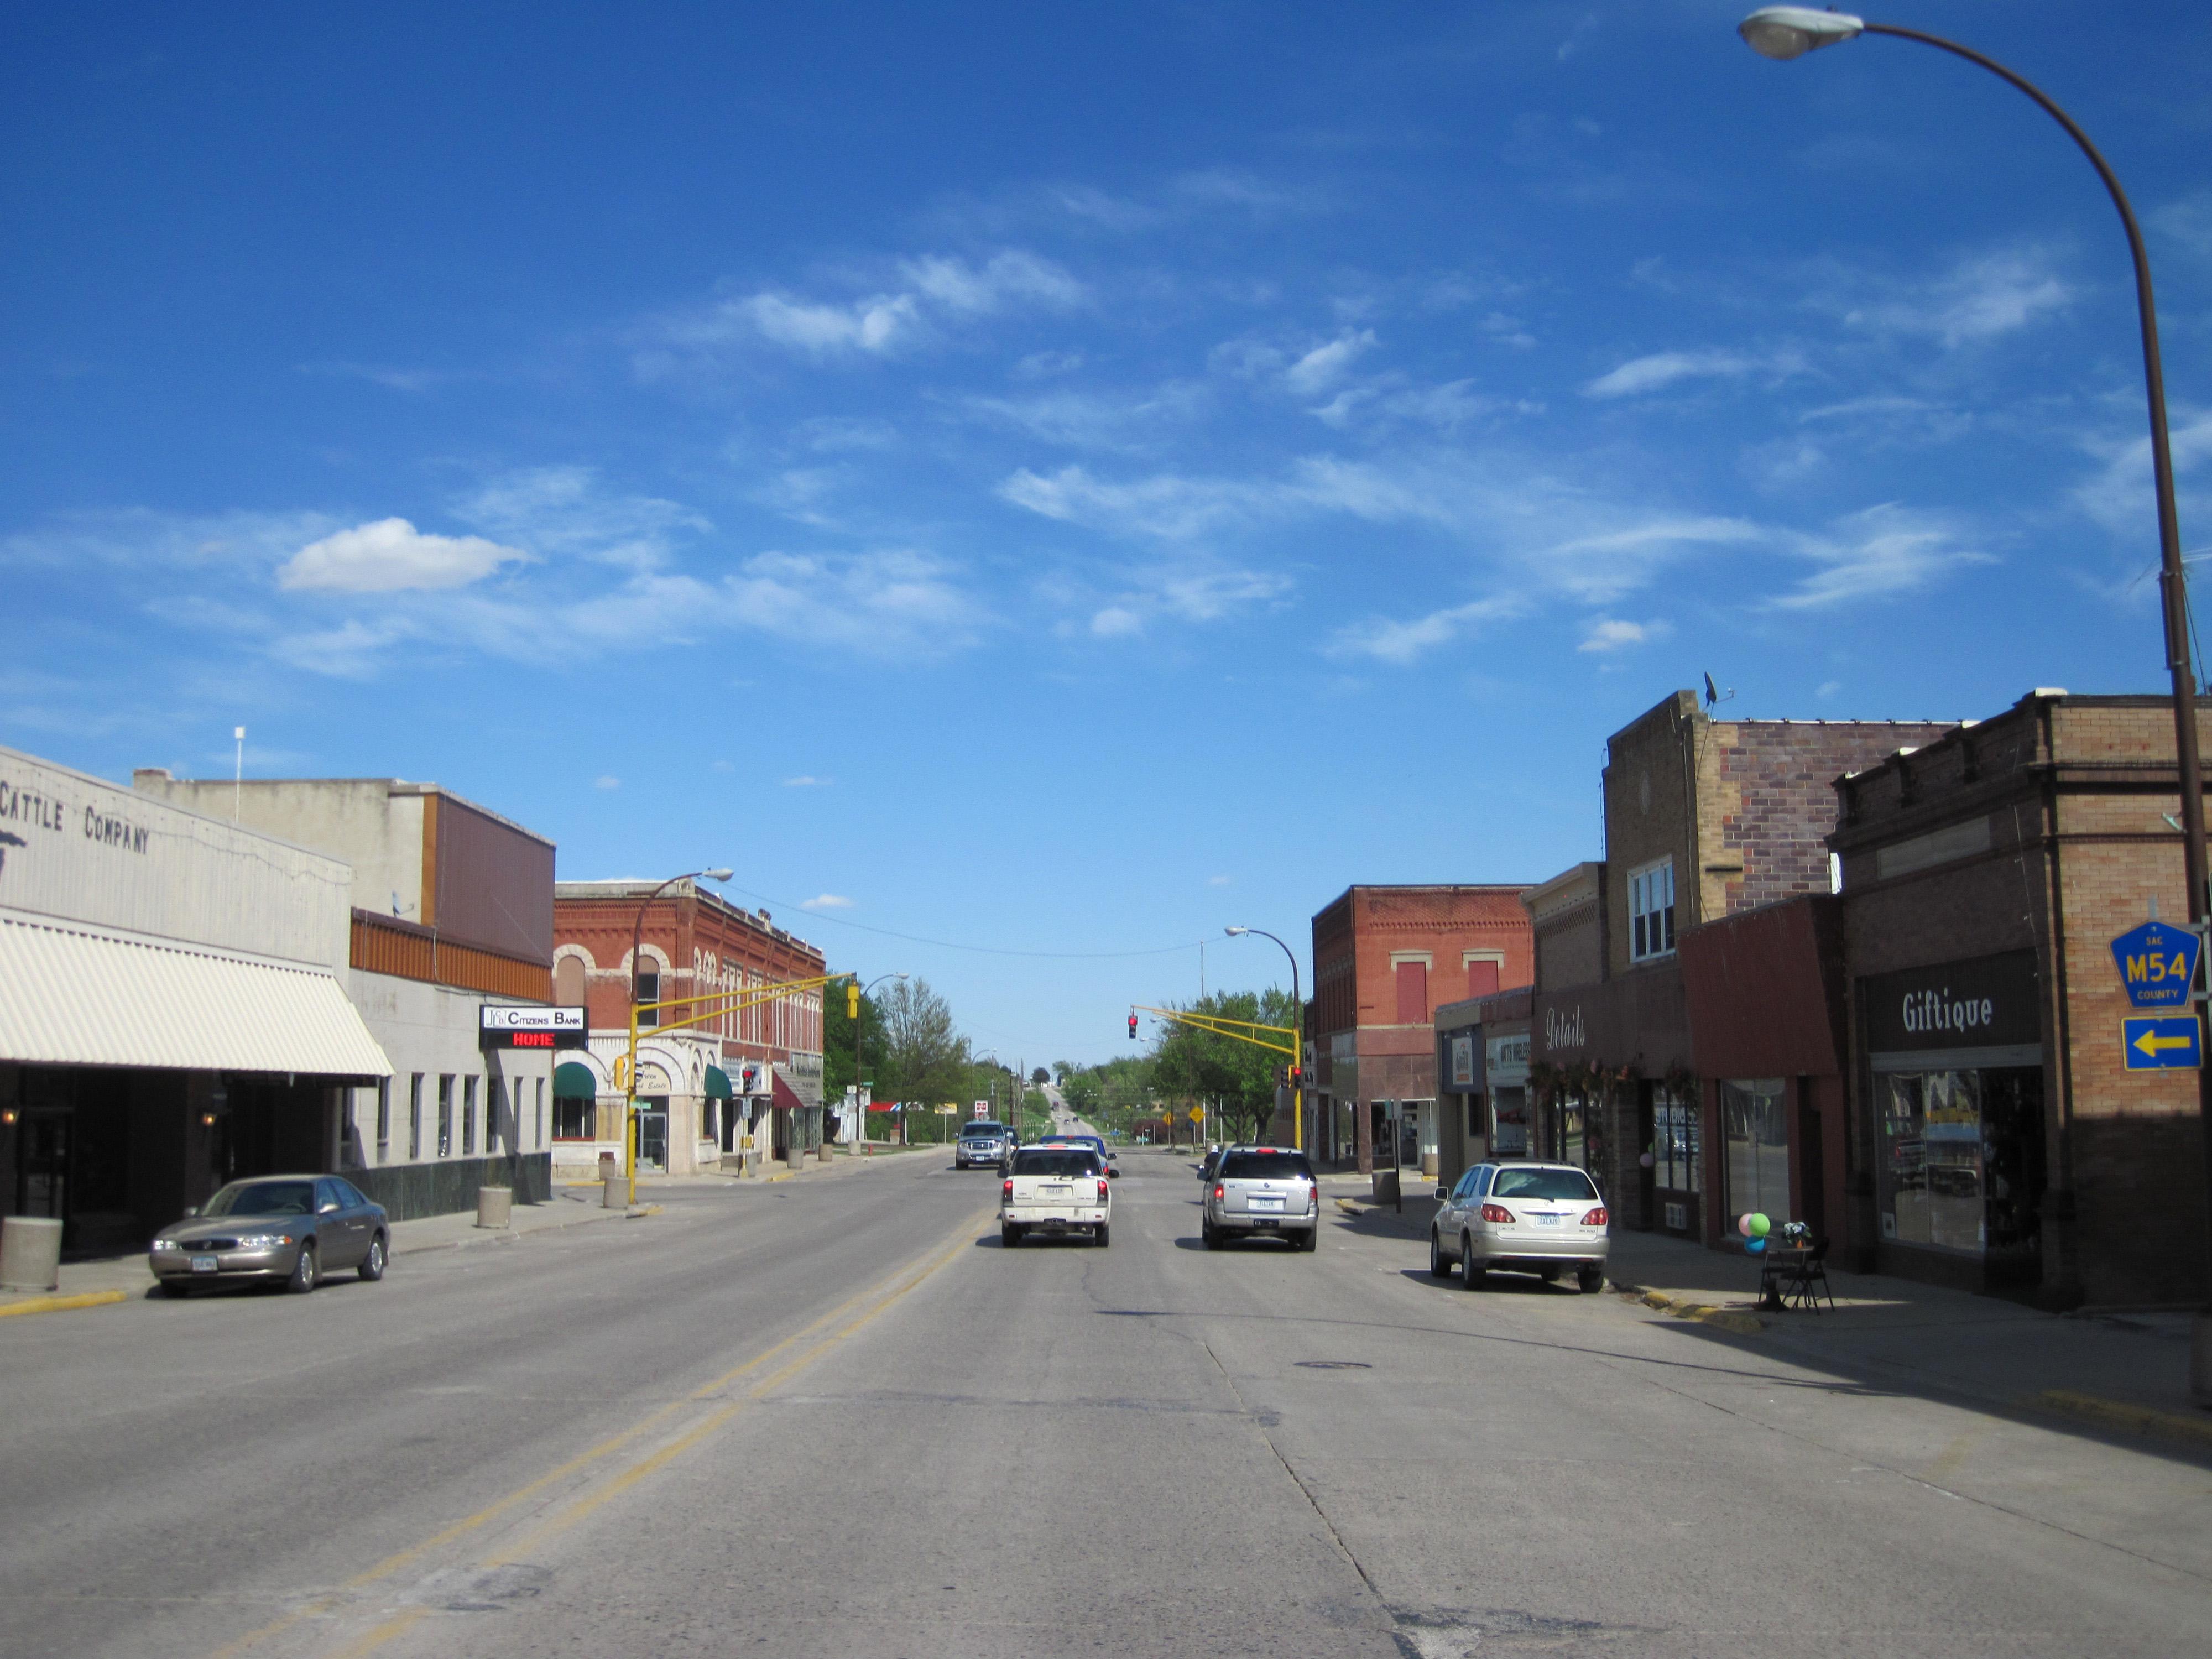 nike air max 41 - Sac City, Iowa - Wikipedia